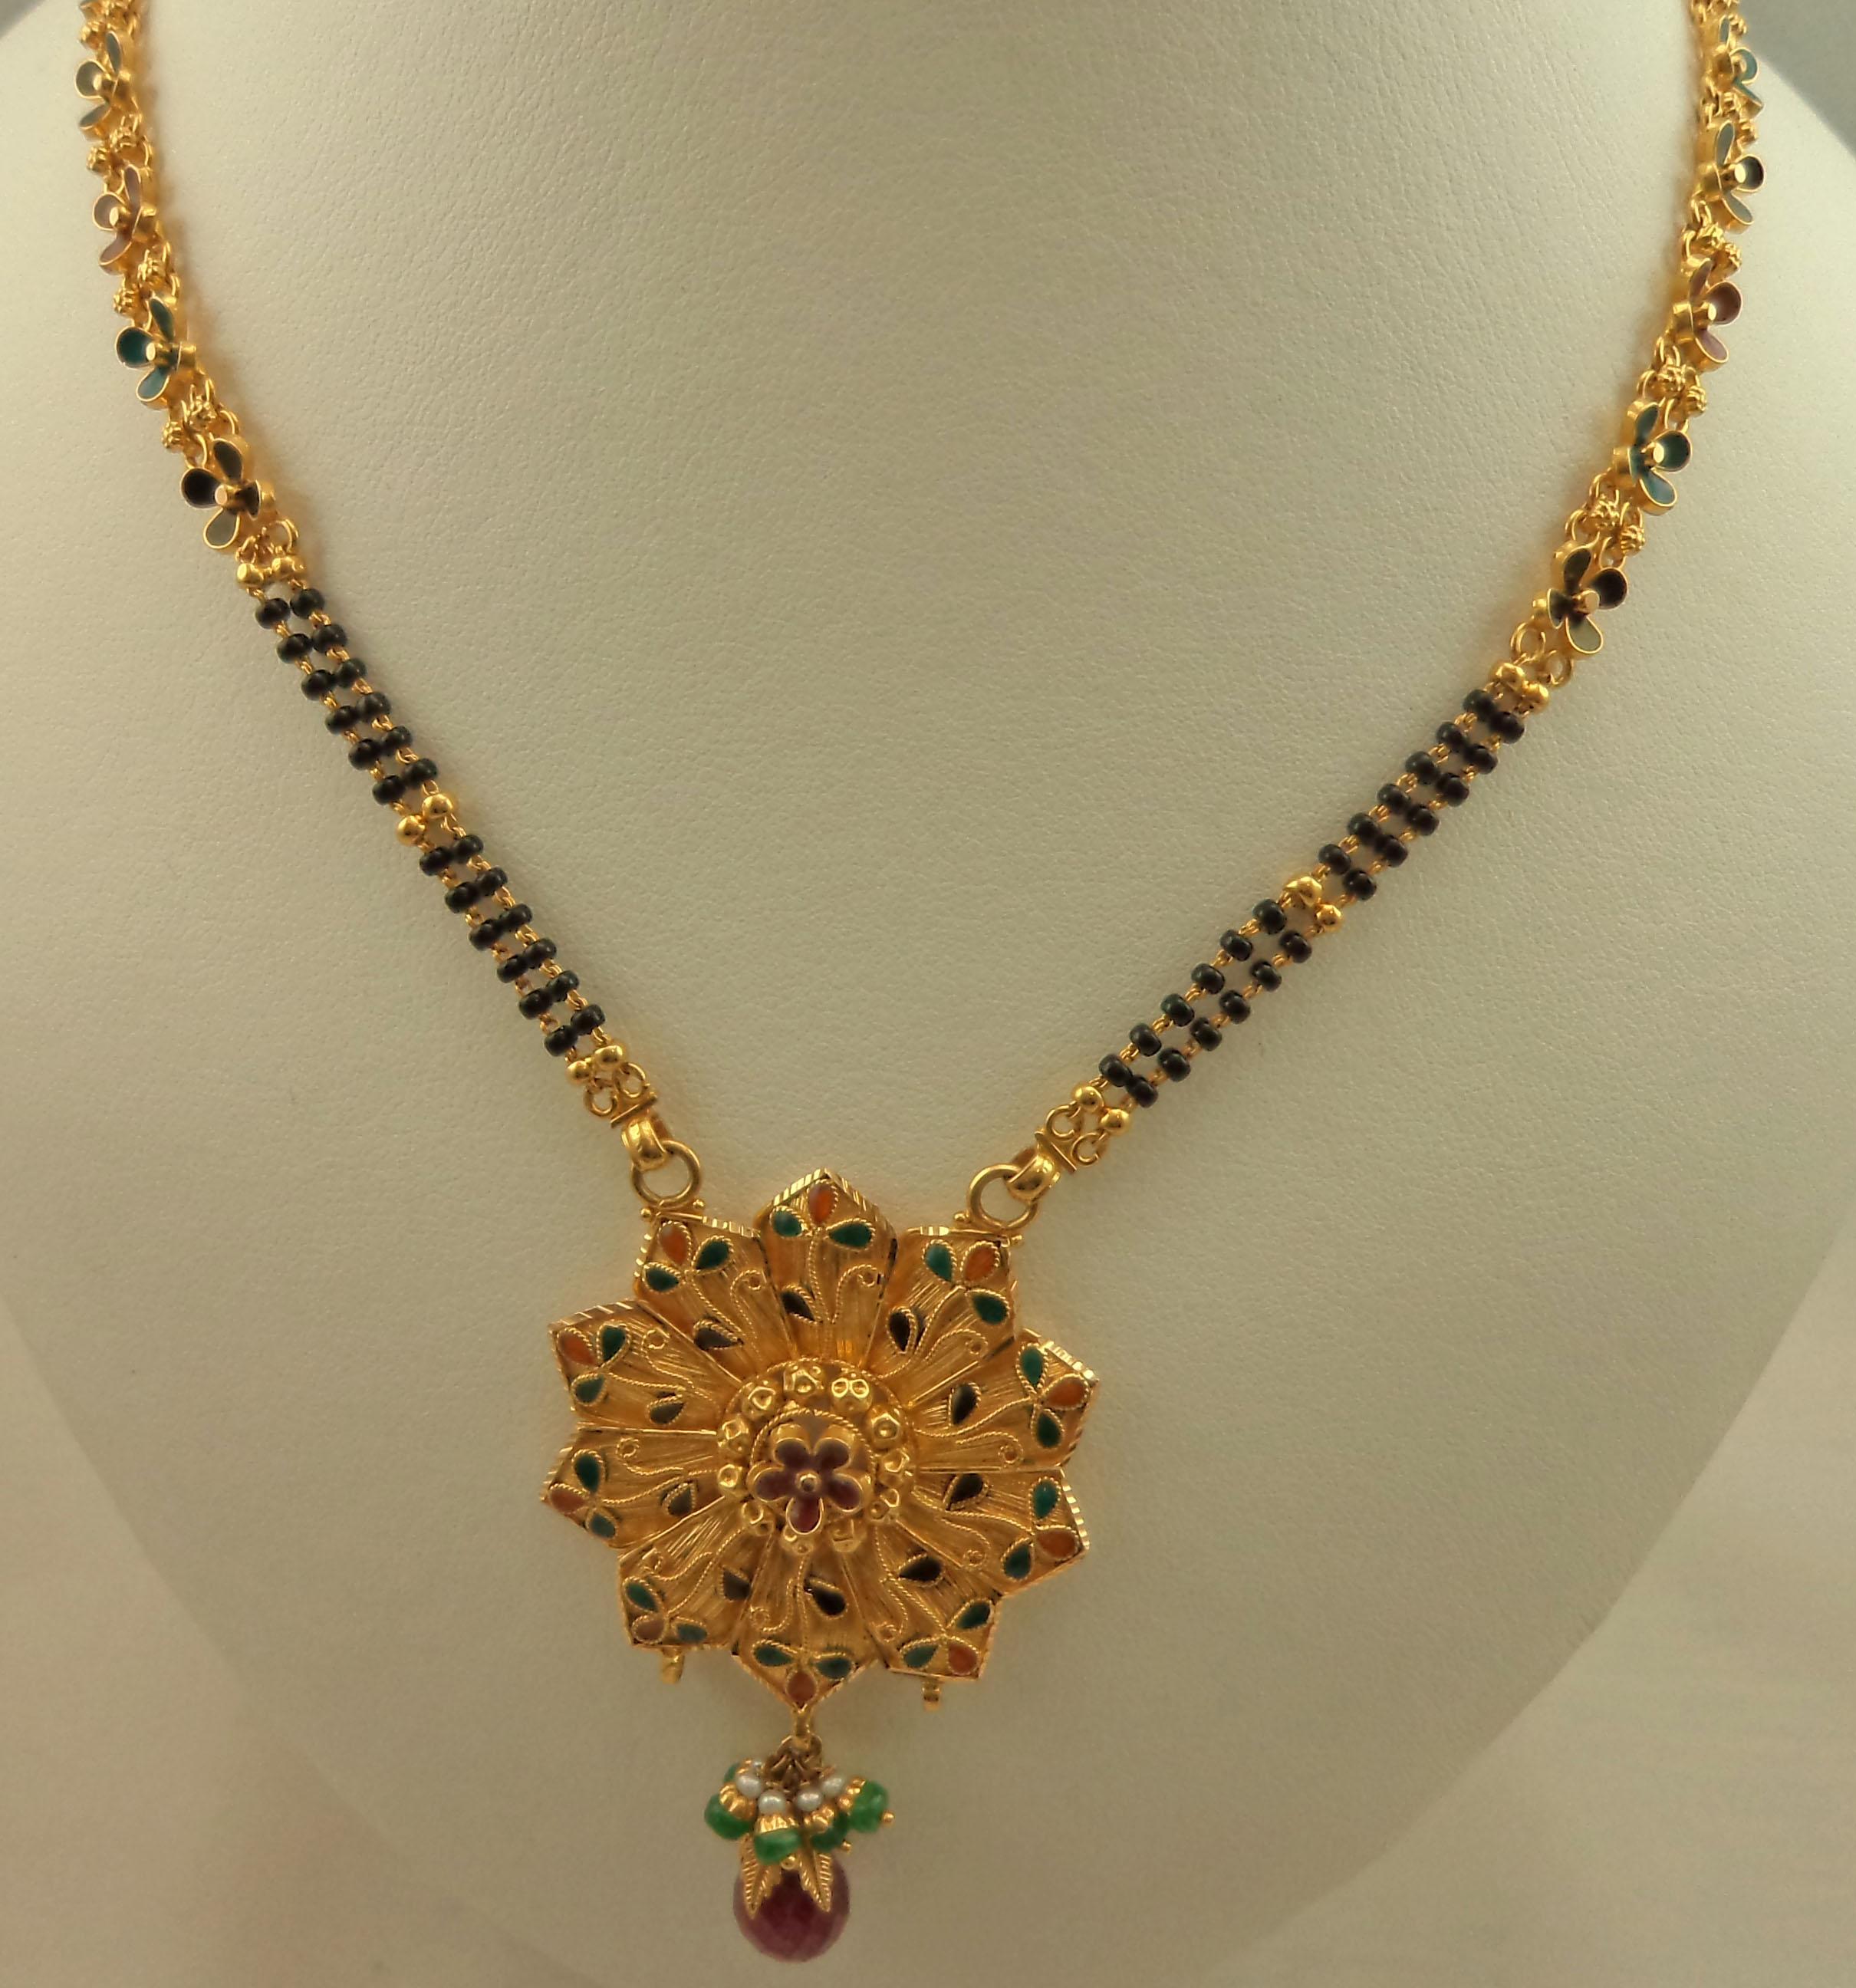 22 Karat Gold 2 Rows Long Mangalsutra With Meenakari